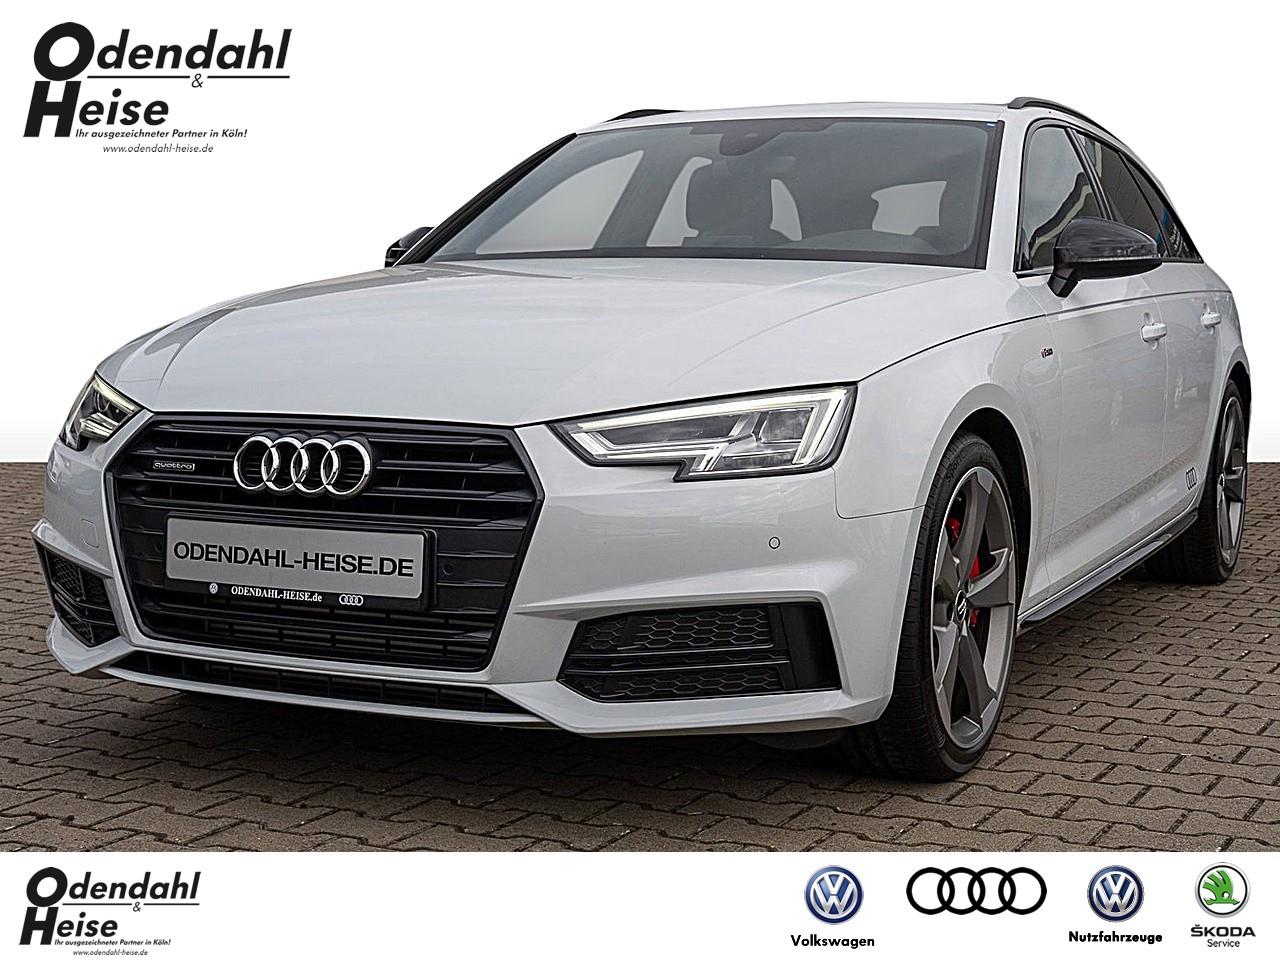 Audi A4 Avant sport 2.0 TFSI quattro S line Klima, Jahr 2018, Benzin